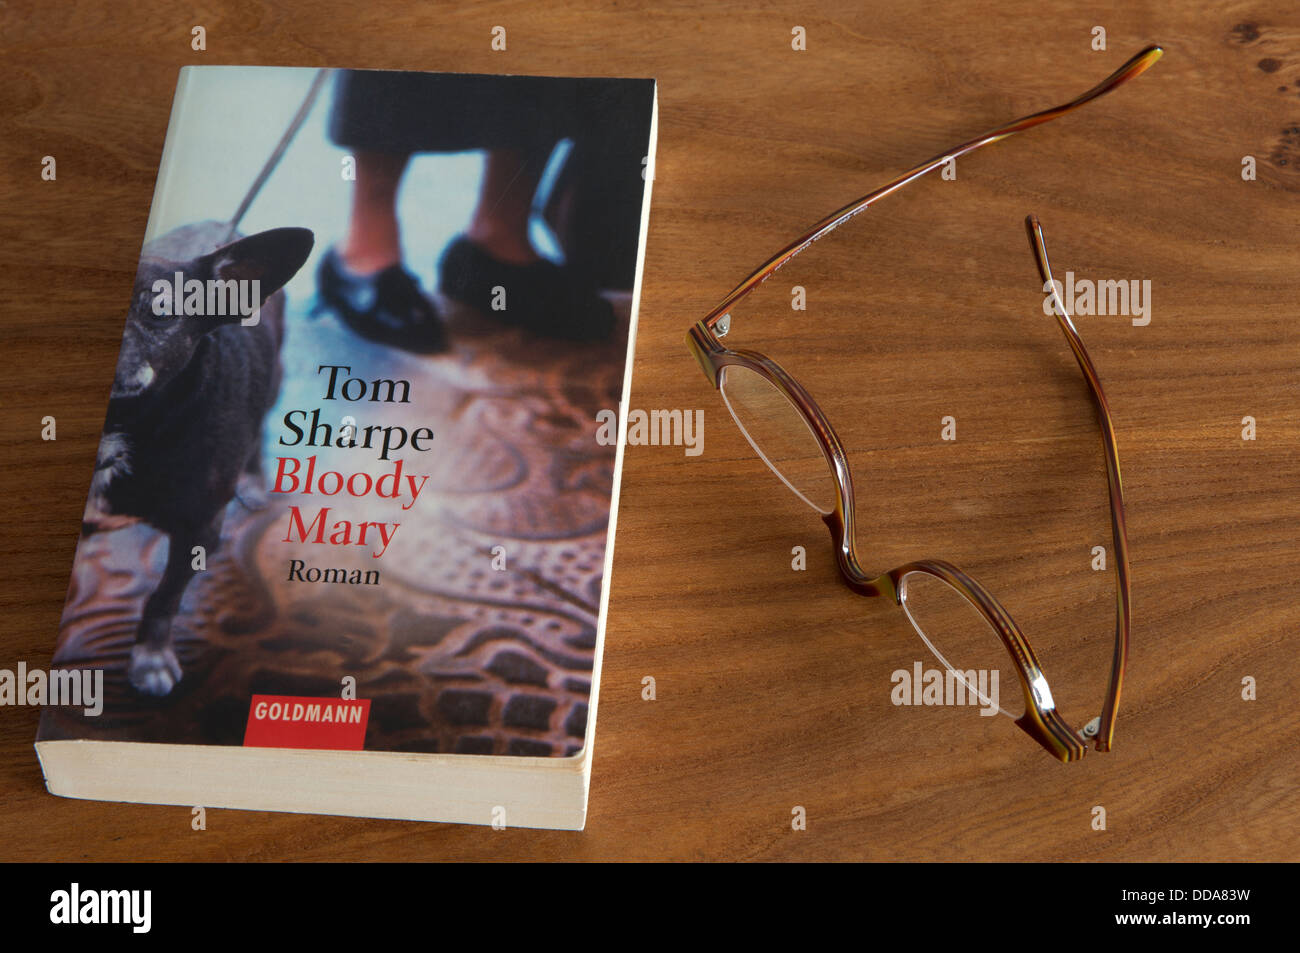 Tom Sharpe 'Bloody Mary' novel published by Goldmann - Stock Image